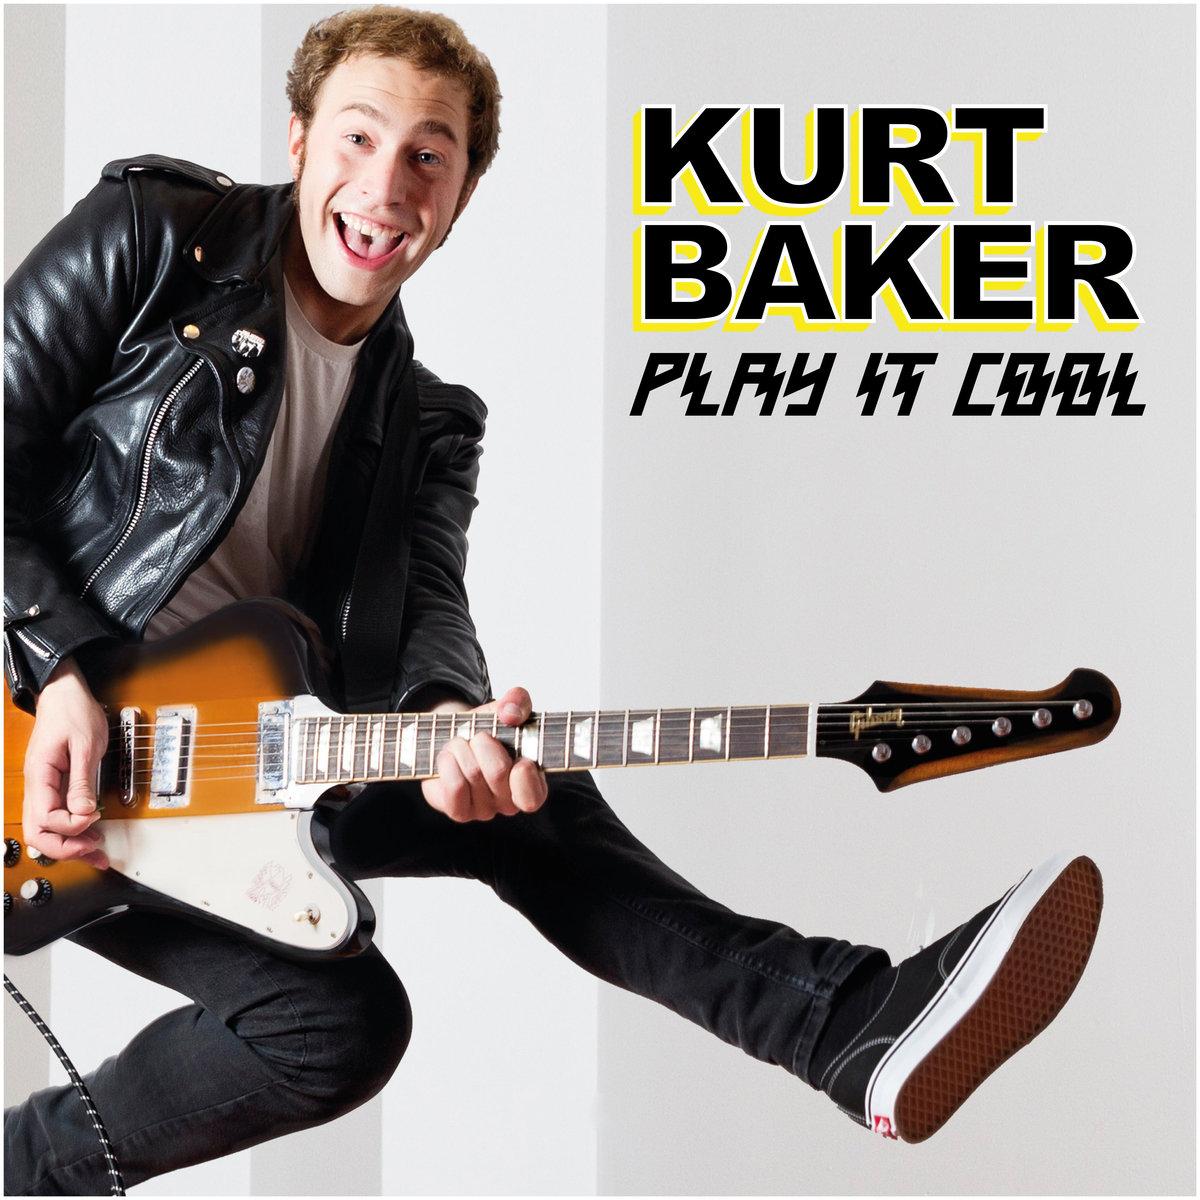 Play It Cool - Listen, Reviews, Buy It!